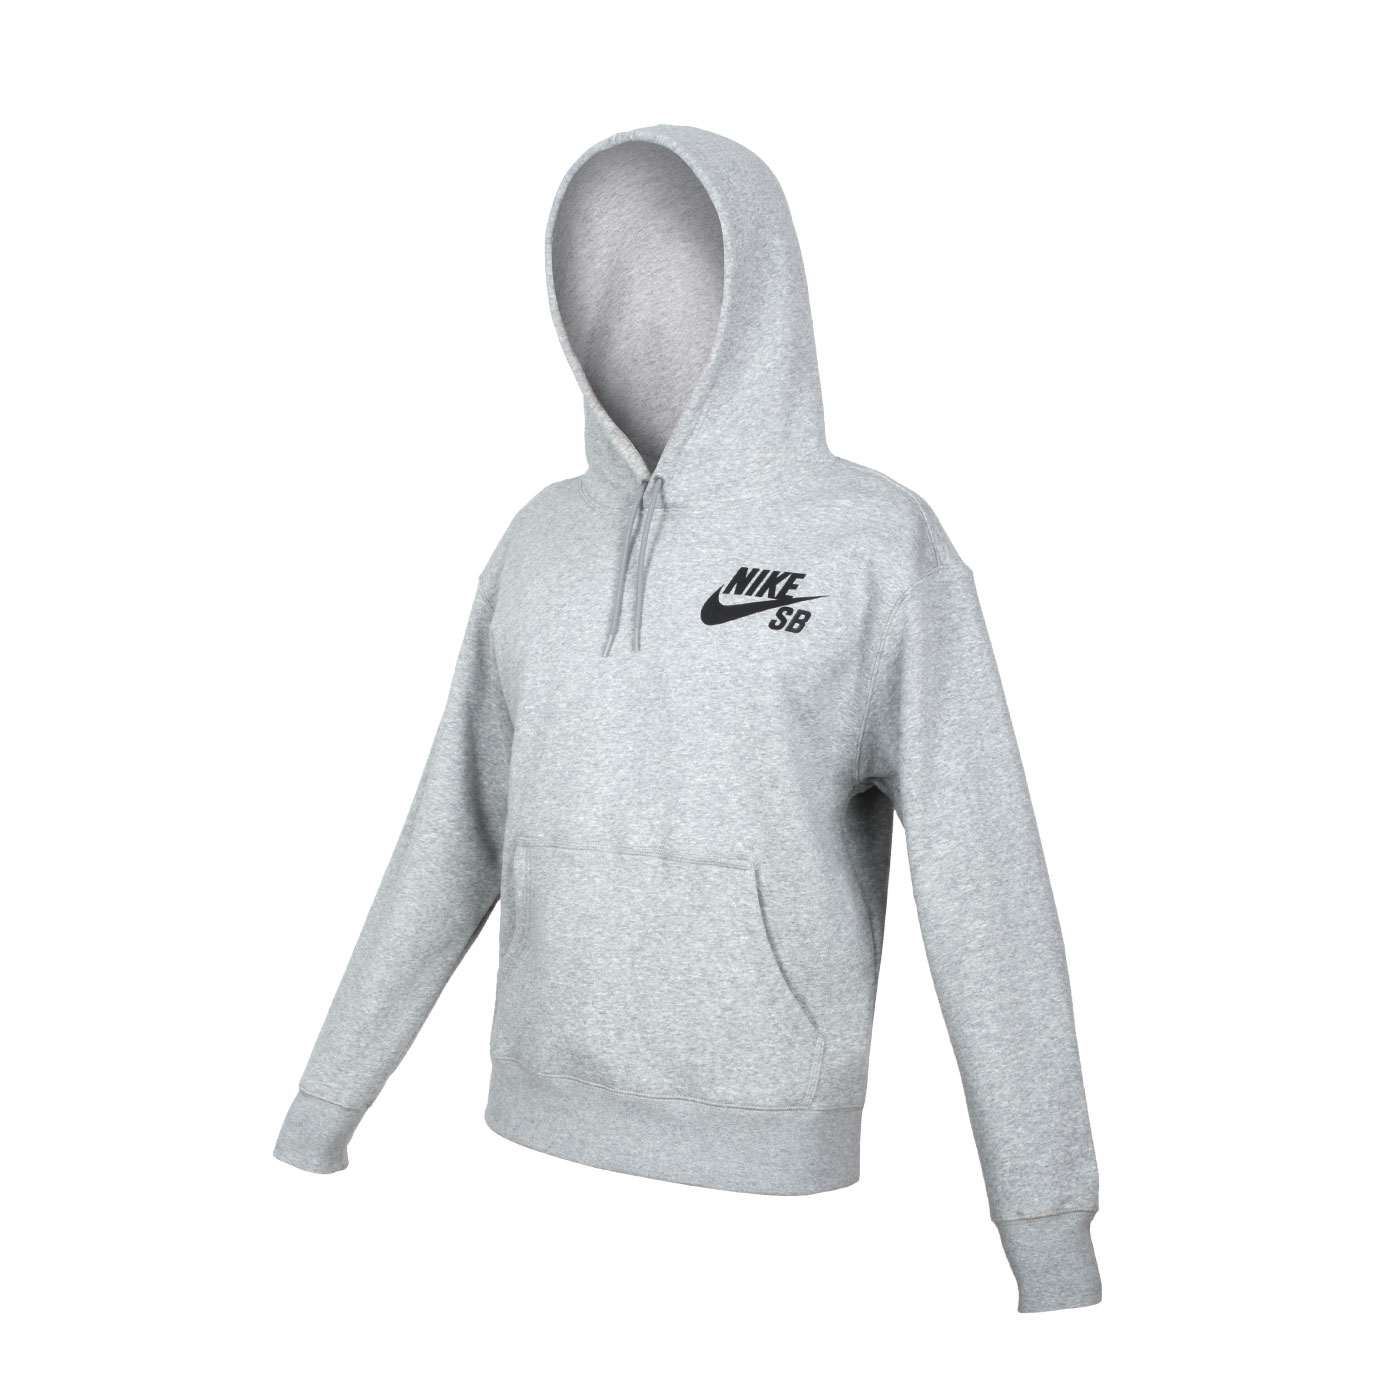 NIKE 男款長袖連帽T恤 CW7065-063 - 灰黑